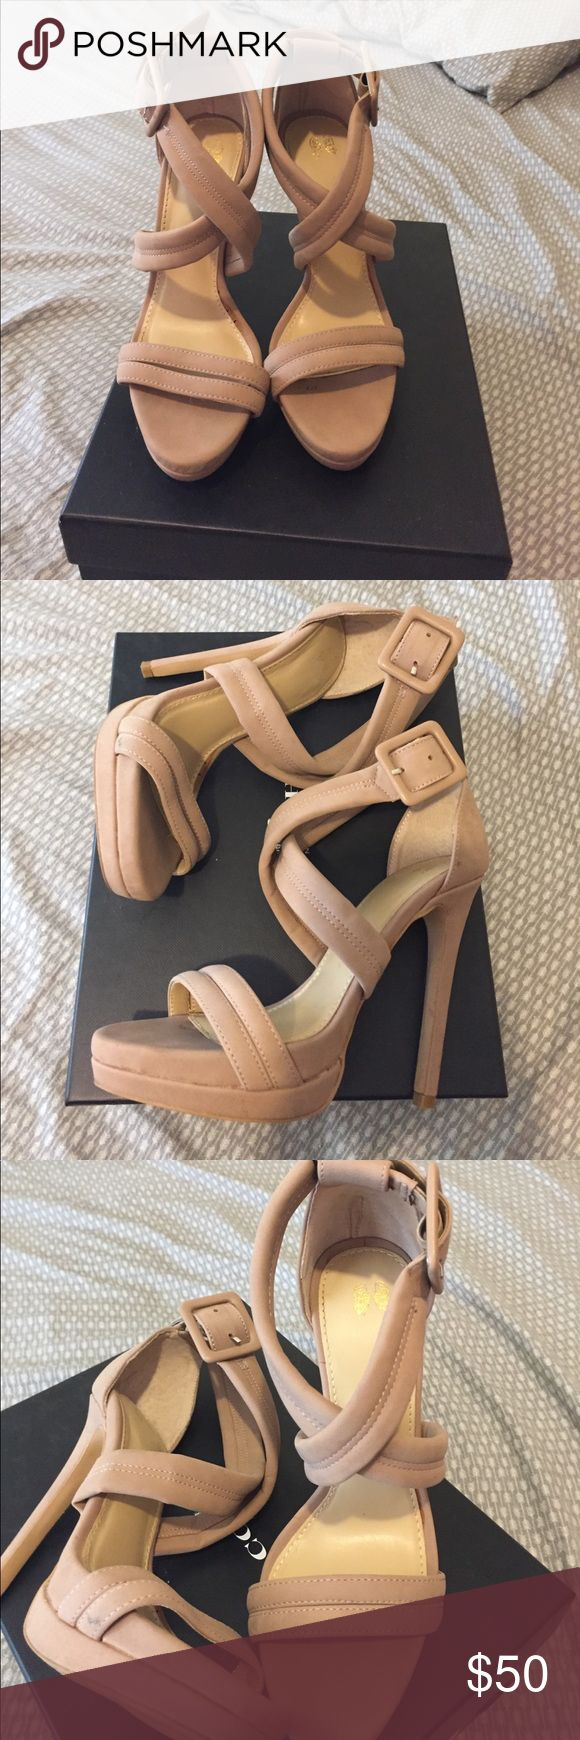 Victorias Secret nude high heels Cute nude strappy high heels. Only worn once. Victoria's Secret Shoes Heels